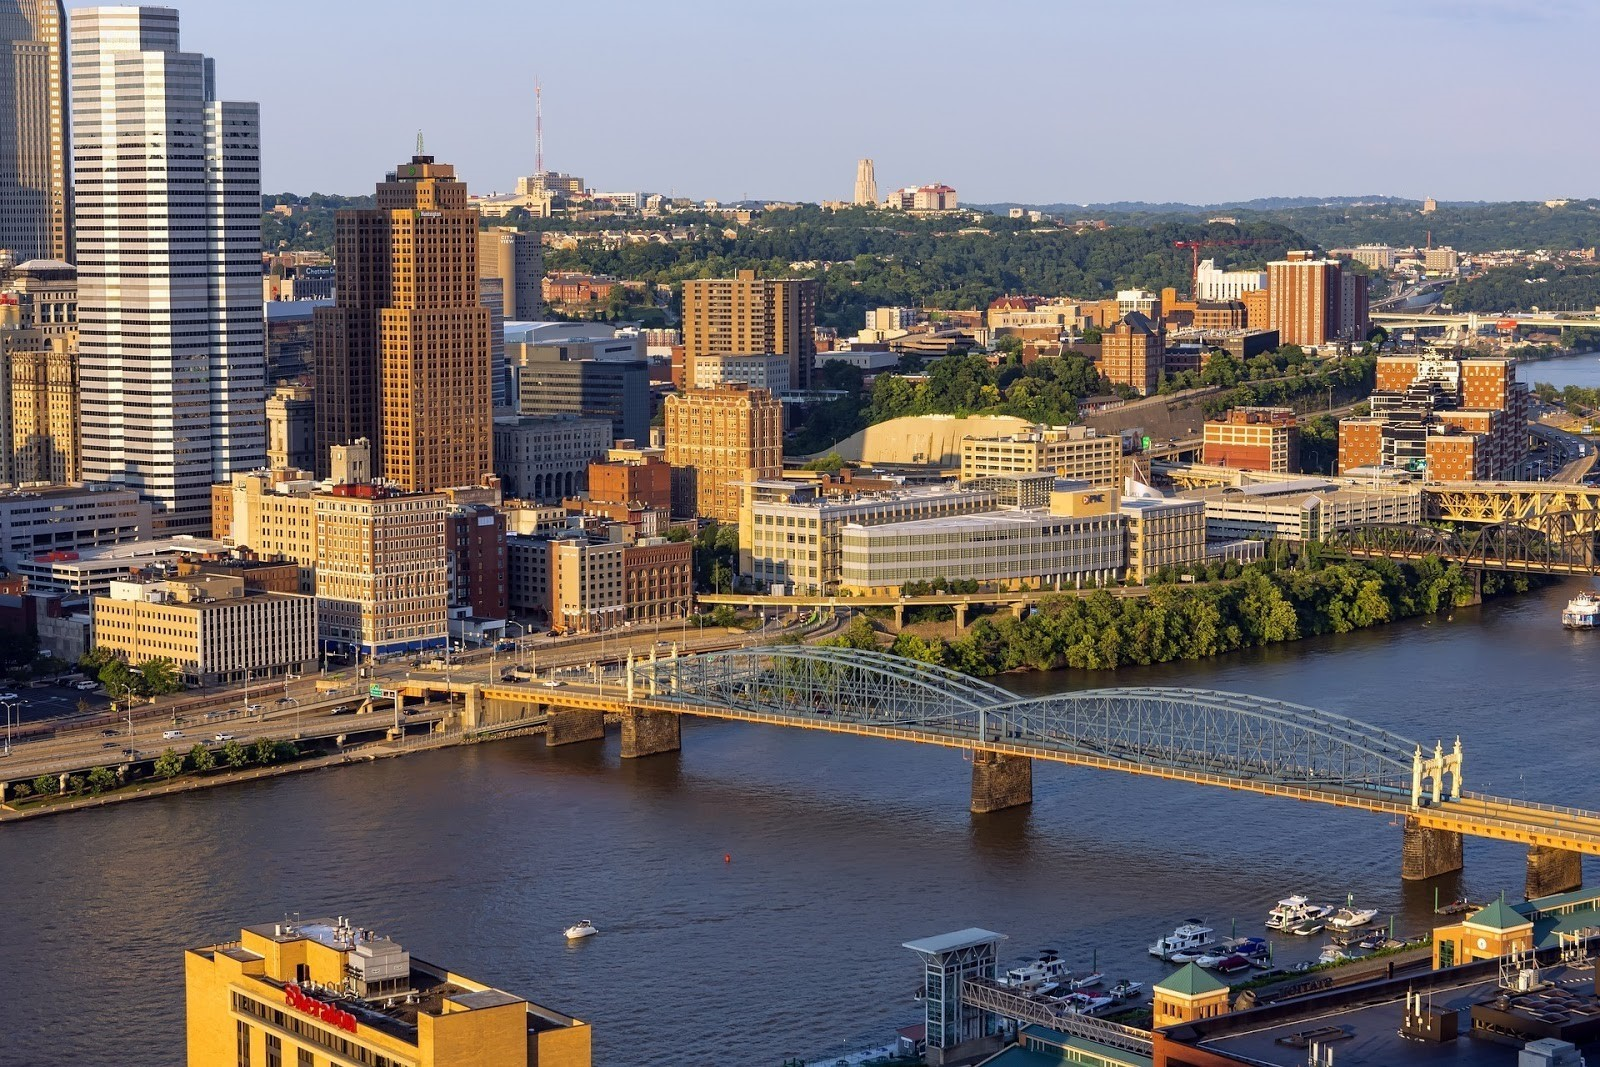 A bridge in Pittsburgh.